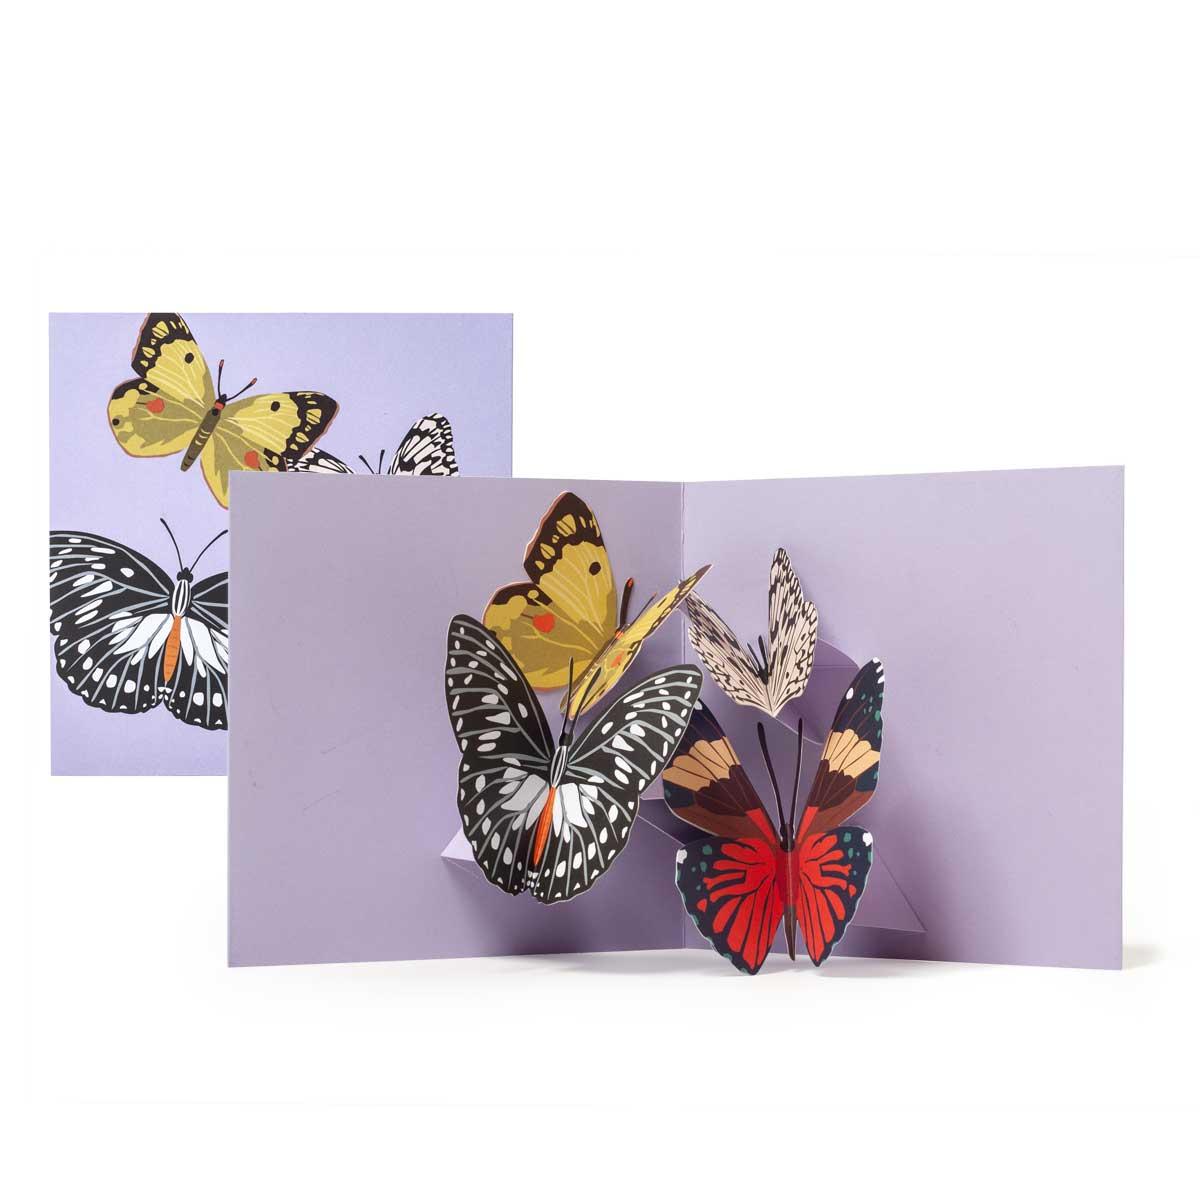 2-to-Tango_4-Butterflies-Pop-up-card_MaikeBiederstaedt.jpg